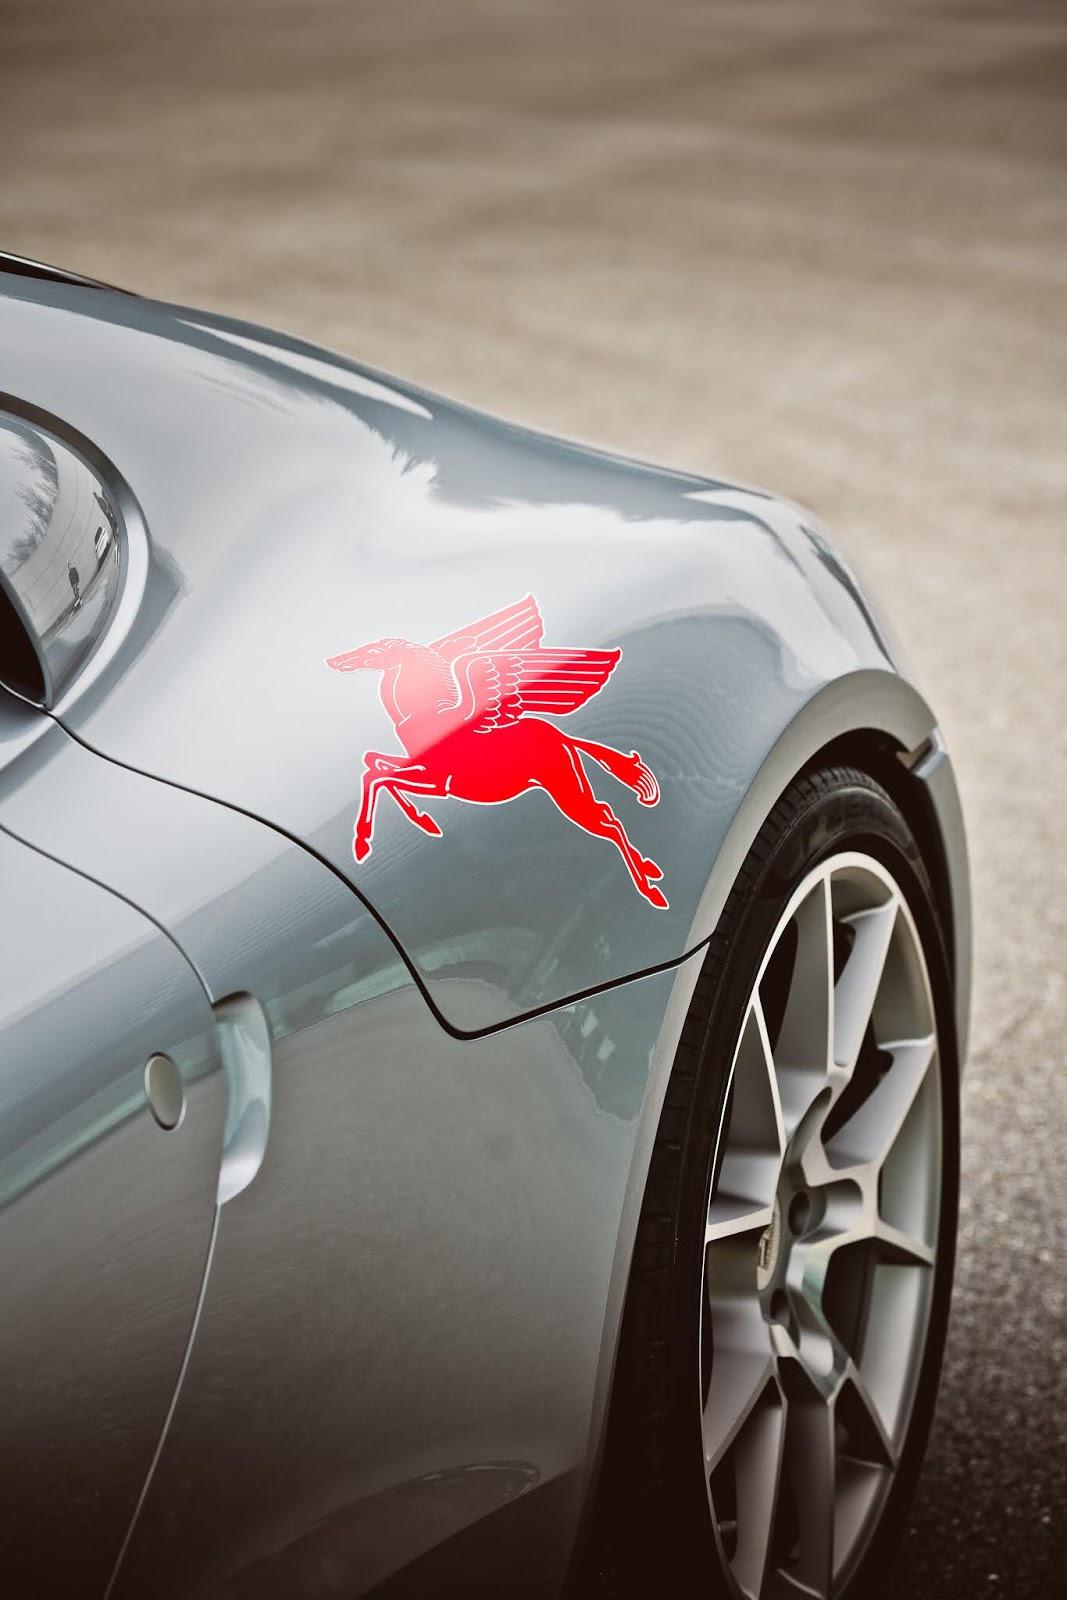 CVS0750 Le Mans Living Legend : Το πρωτότυπο που γέννησε την 718 Cayman GT4 LE MANS, Porsche, Porsche Le Mans, Porsche Unseen, sportscar, supercar, supercars, zblog, ειδήσεις